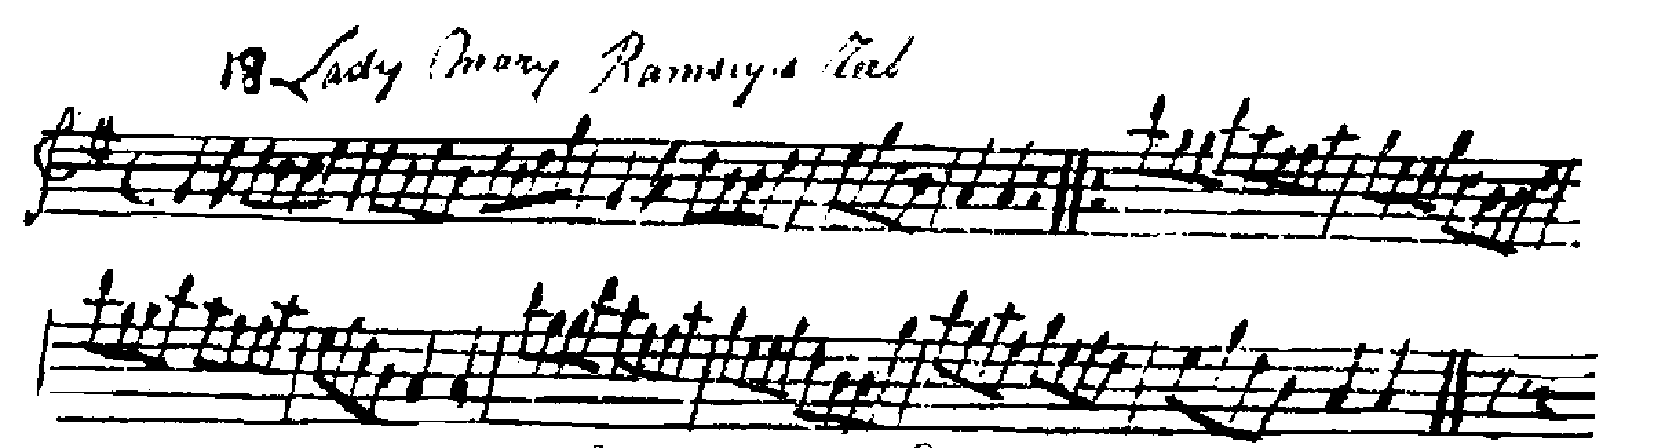 Patrick McGahon MS - No 18 Lady Mary Ramsey